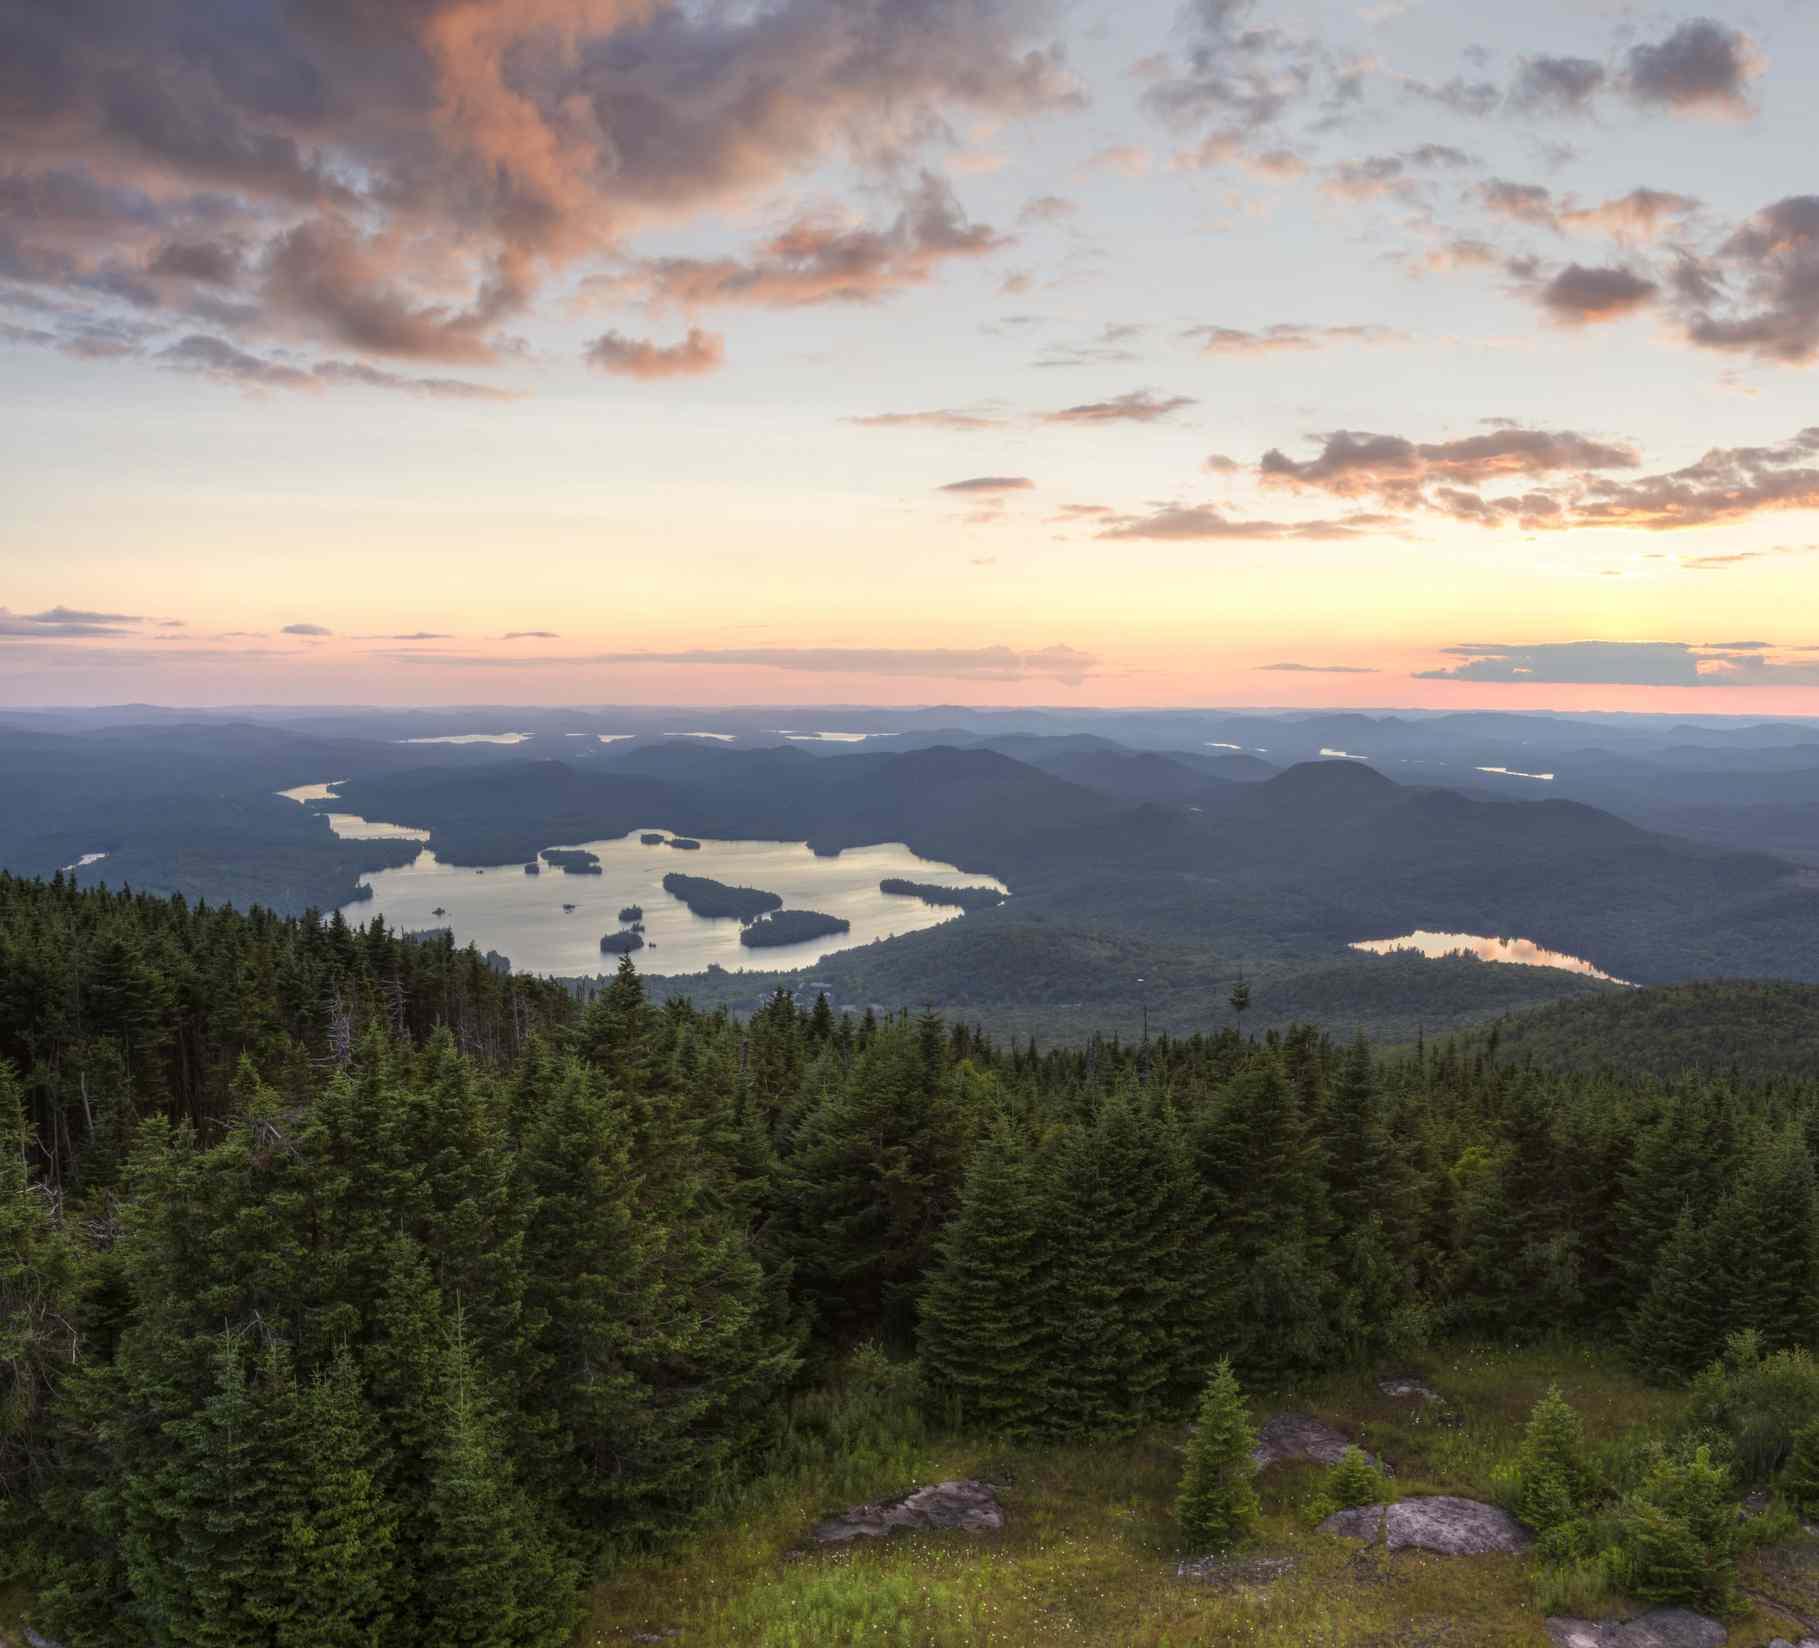 Adirondacks Sunset from Blue Mountain